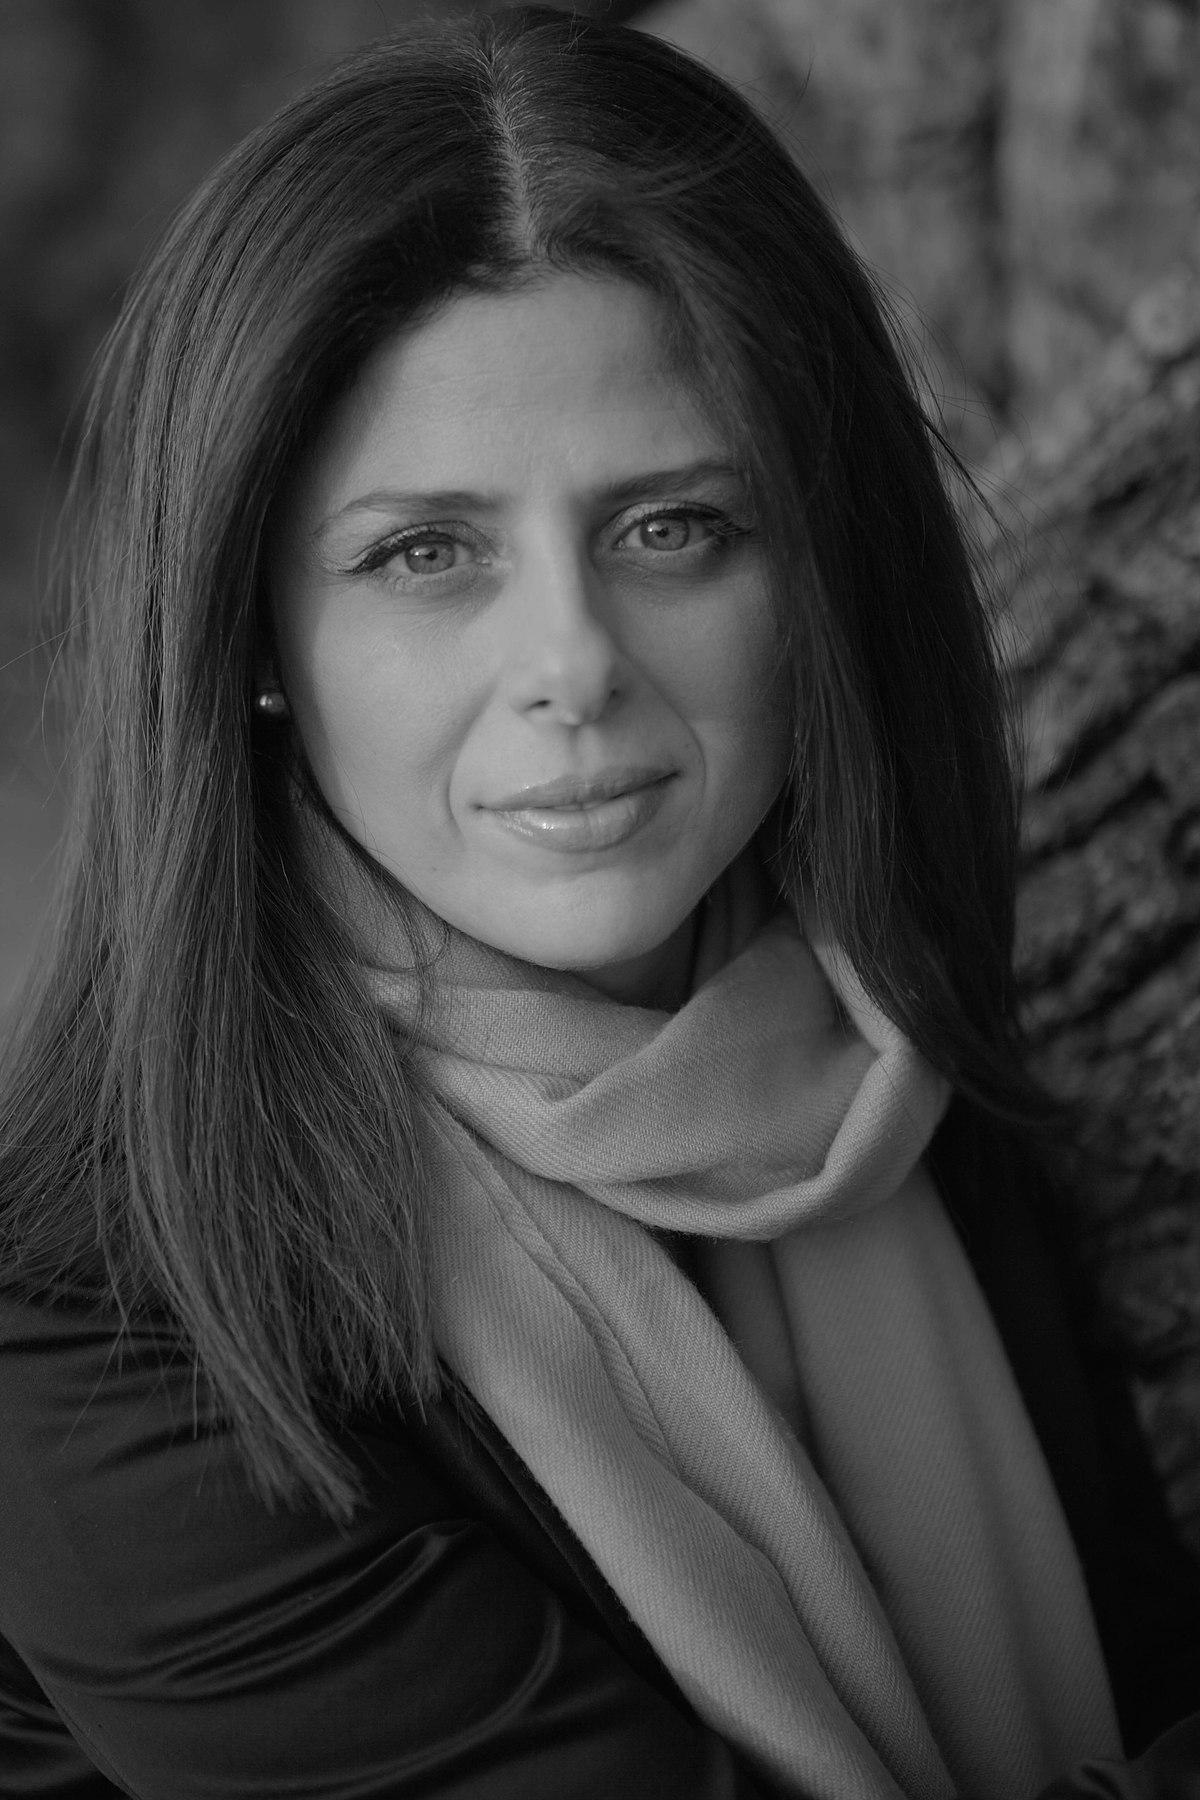 Nathalie Handal Wikipedia